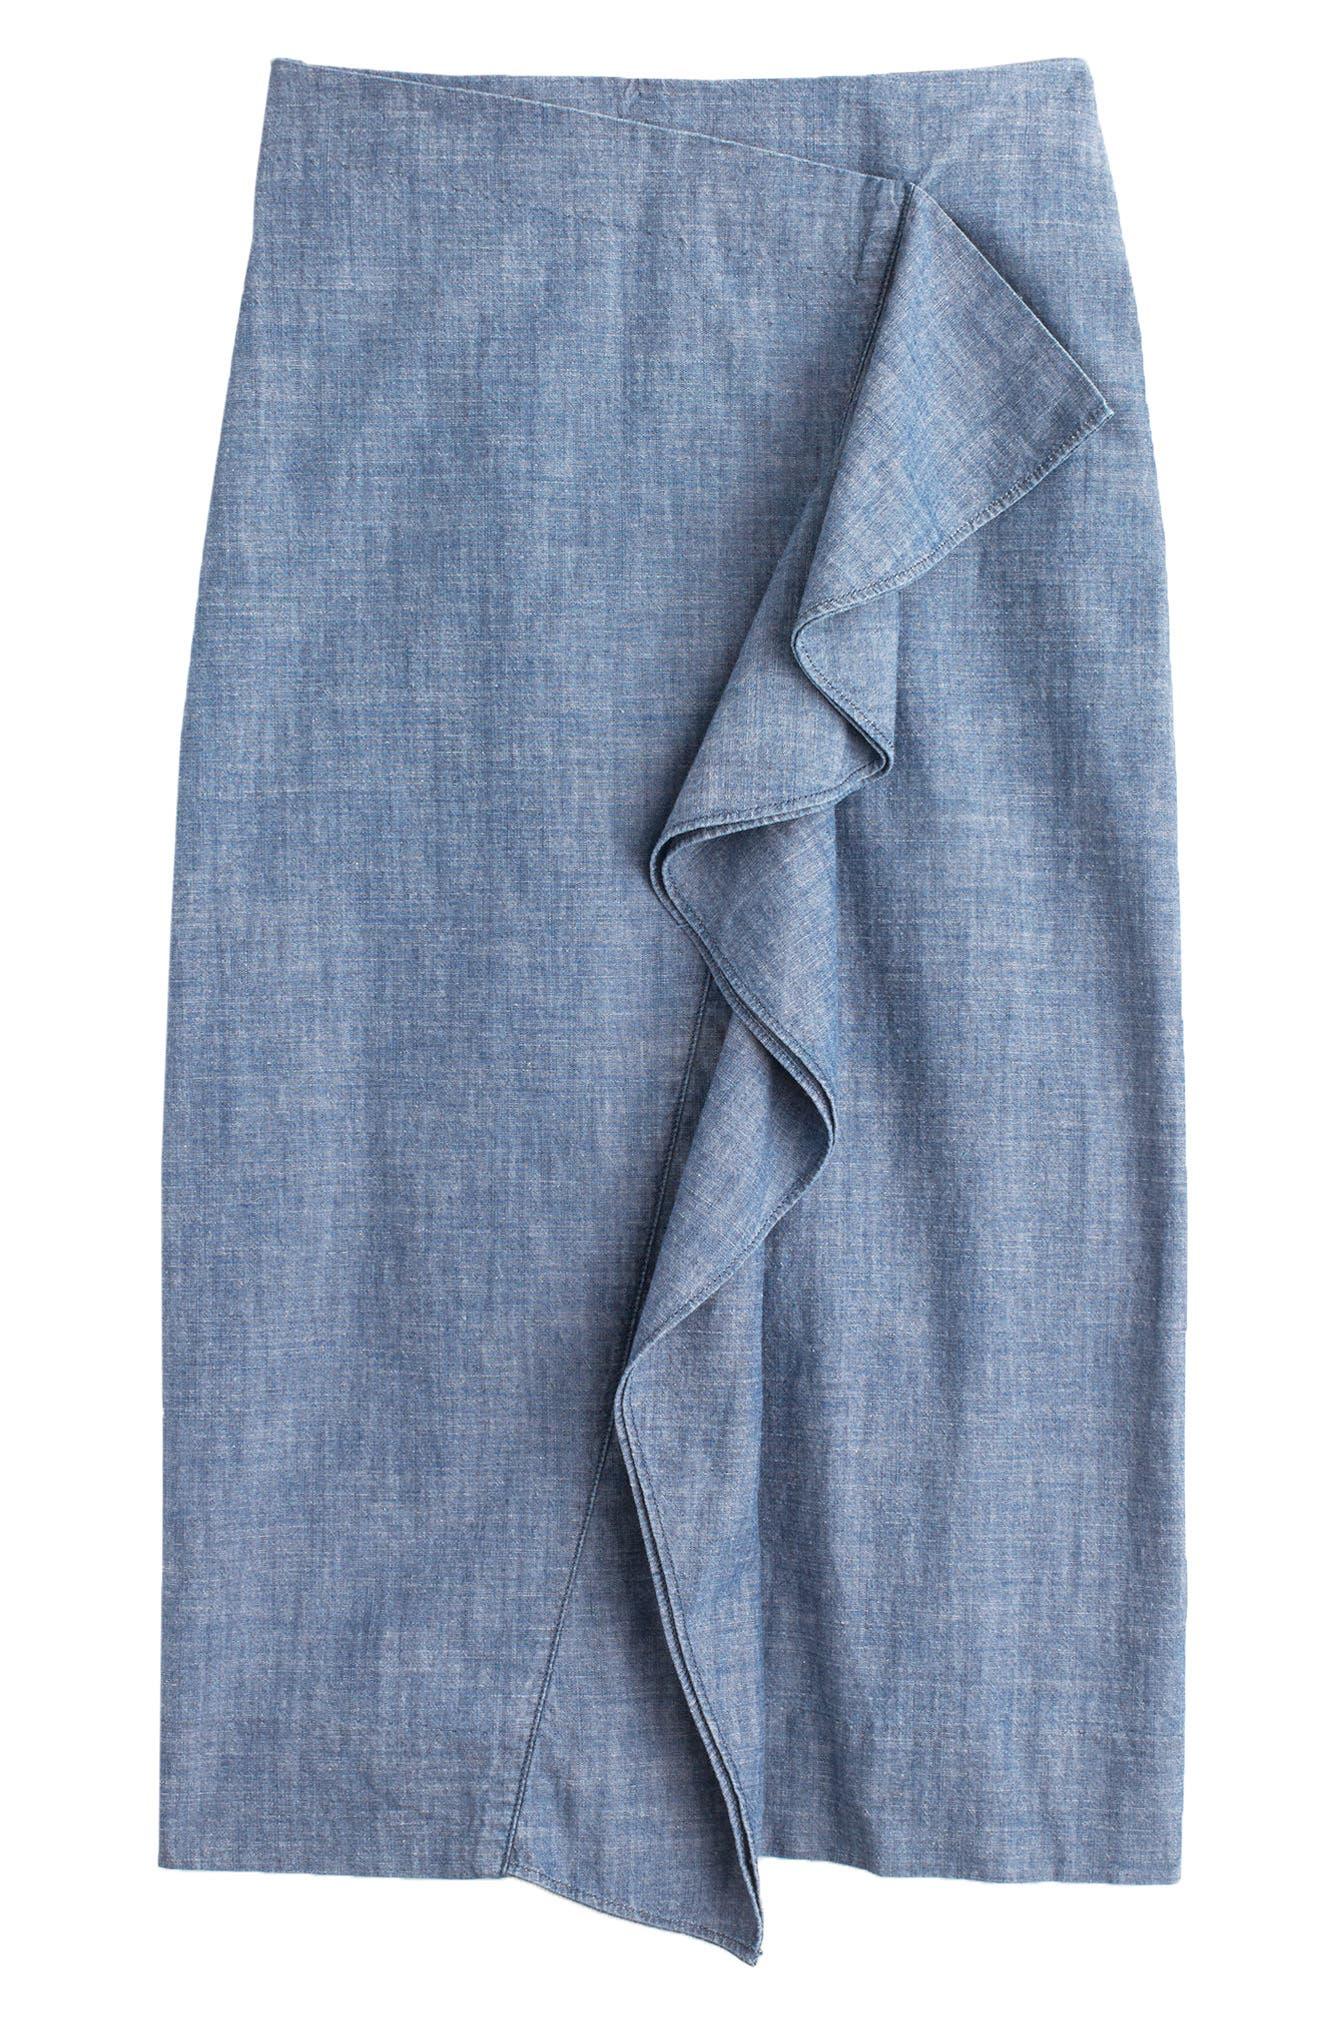 Chambray Ruffle Skirt,                             Alternate thumbnail 4, color,                             Pale Indigo